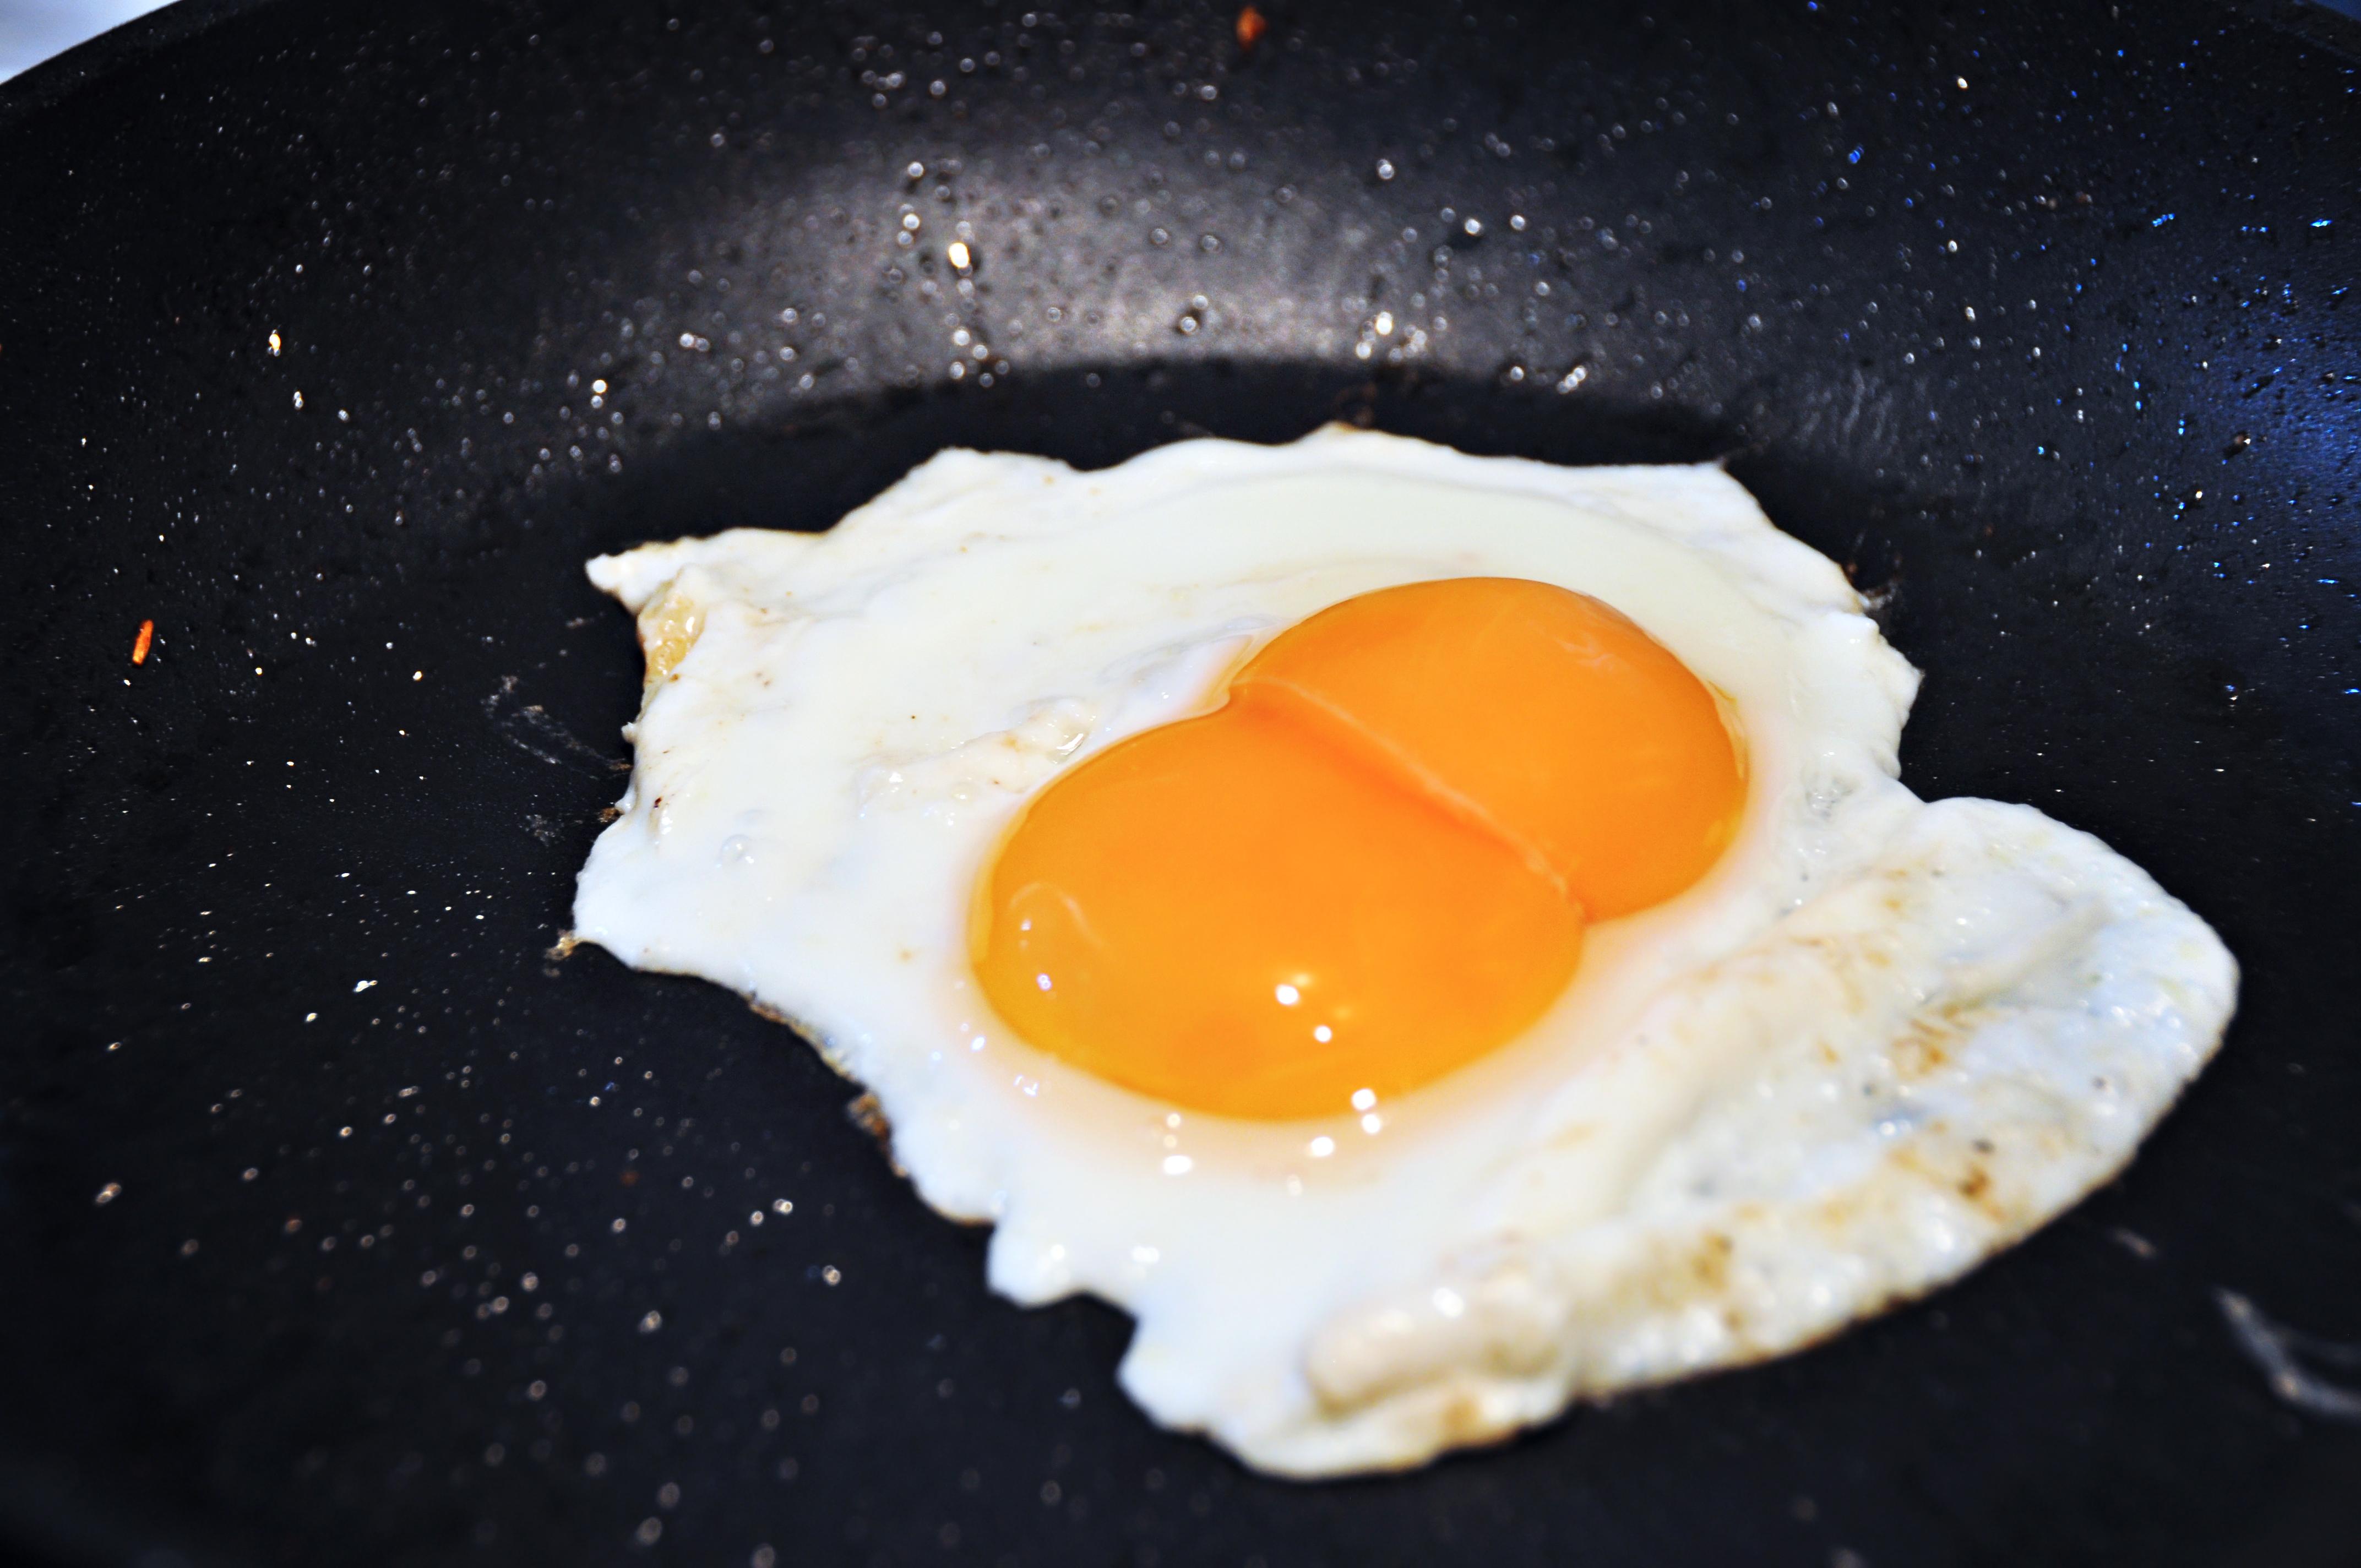 ekstern vibrerende egg date side